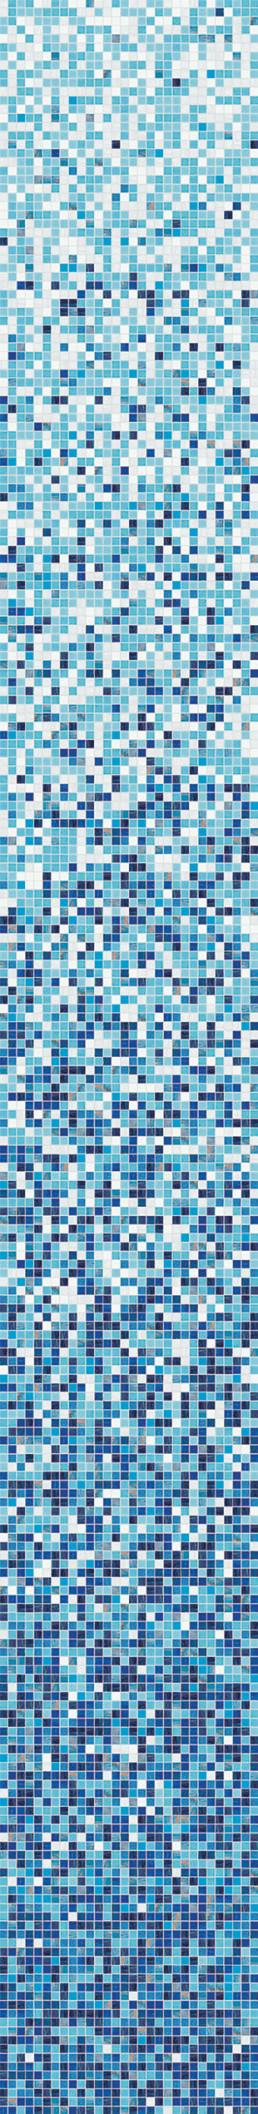 NEW IRIS Mosaic Shading Blend